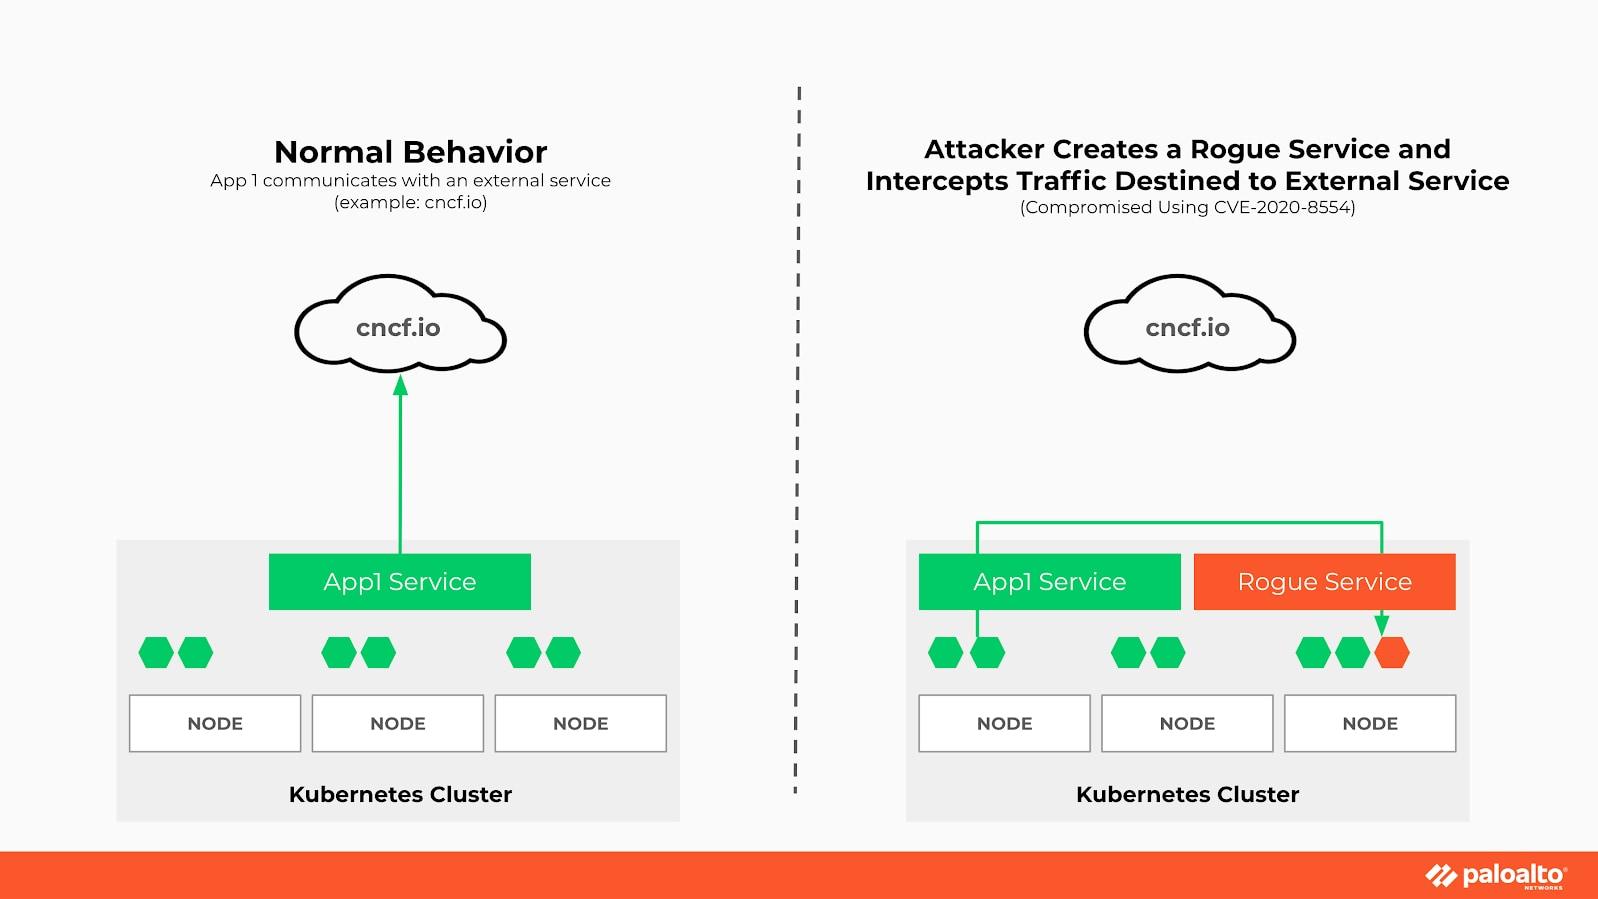 Diagram comparing normal app communication behavior and behavior of a compromised cluster.